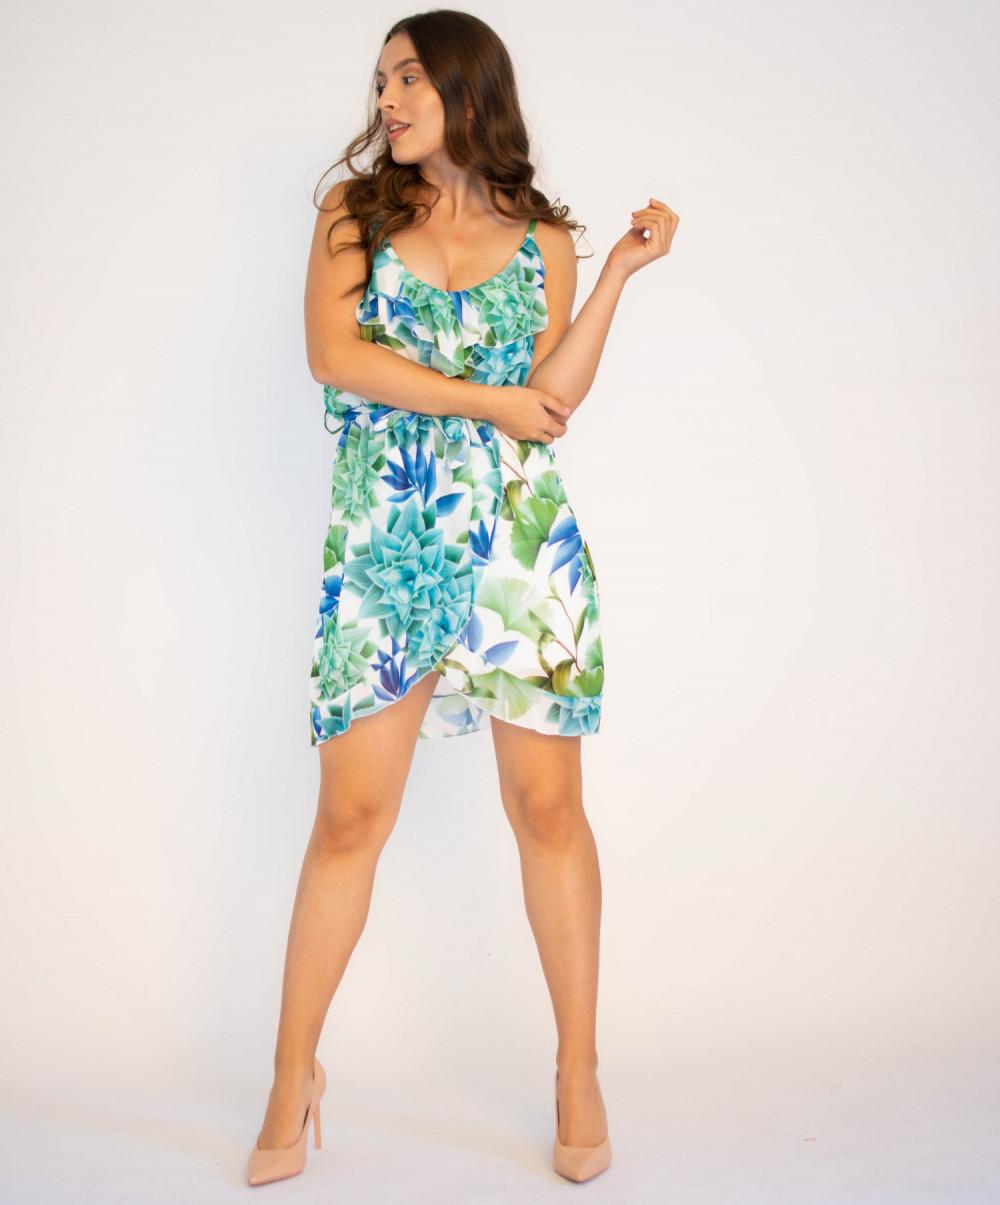 Sukienka kwiatowa na ramiączkach Chrisitina 3